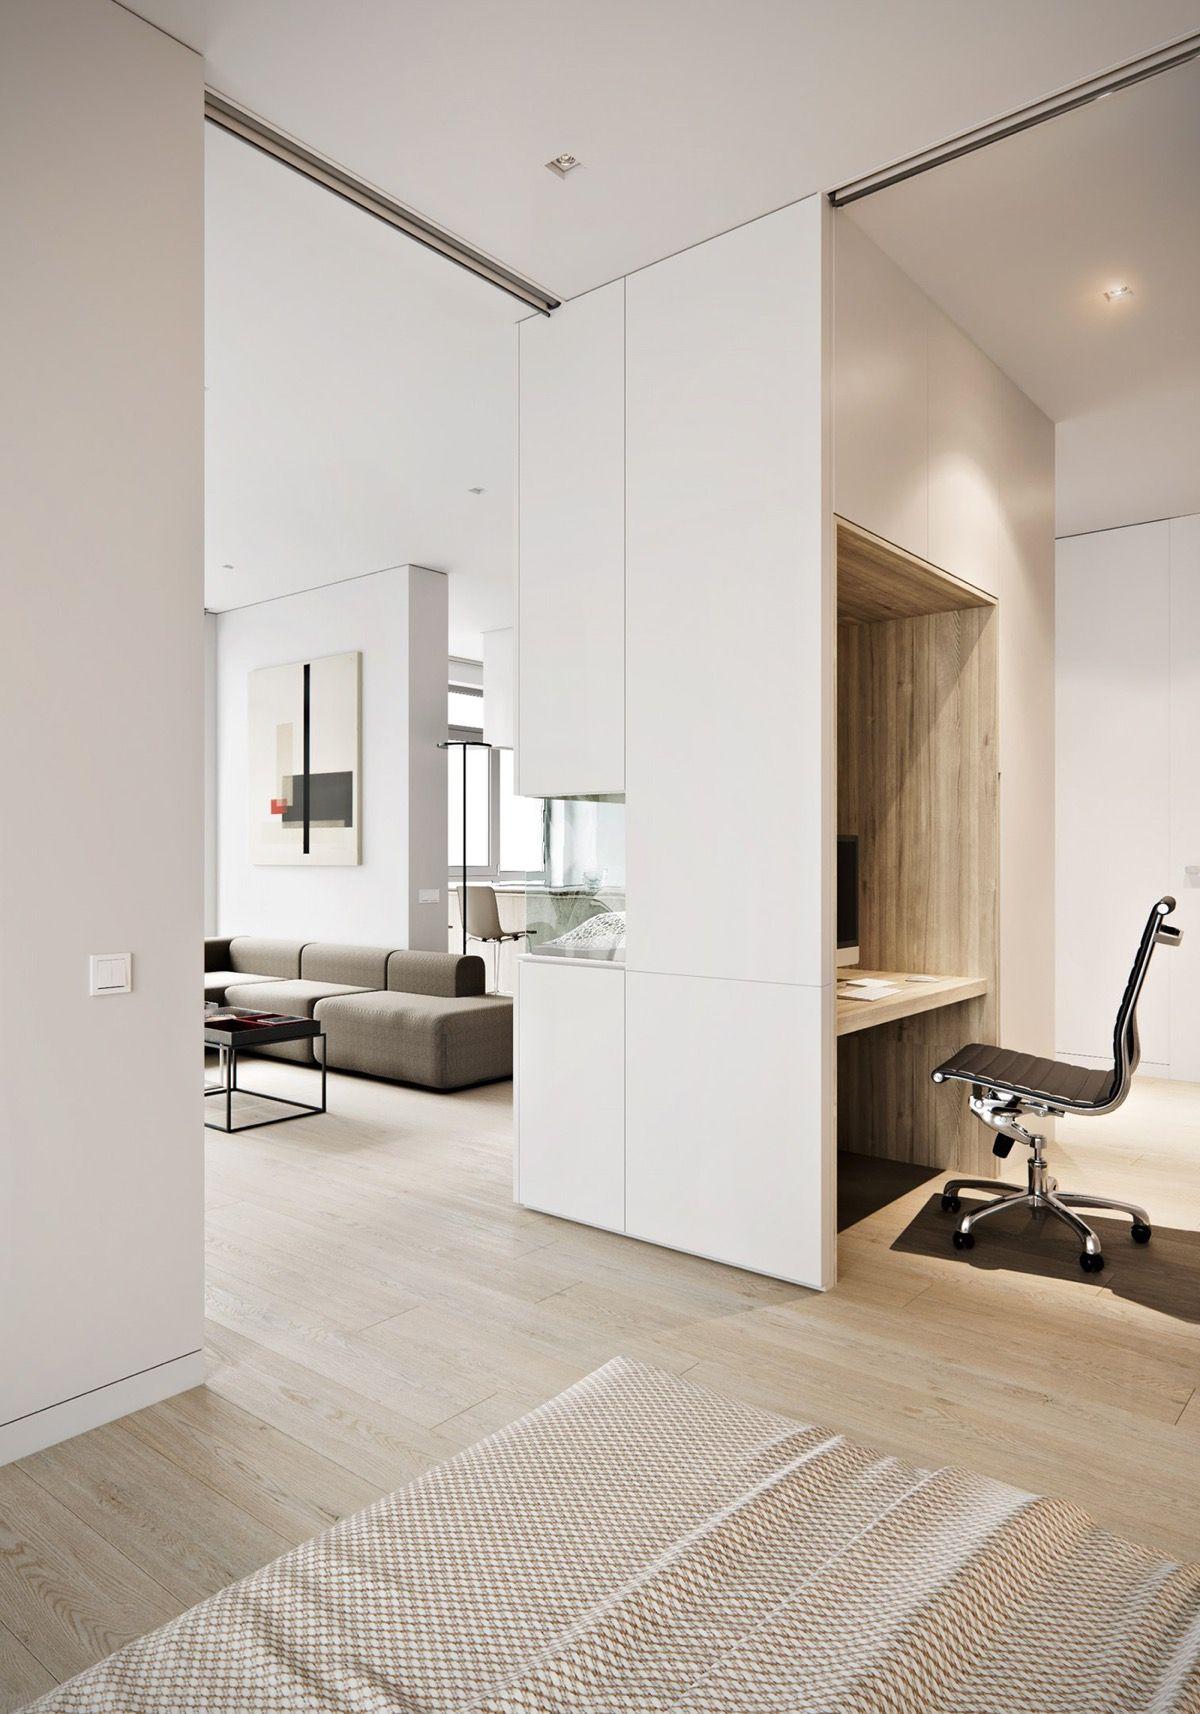 3 One-Bedroom Apartments with Floor Plans   Minimalist ...